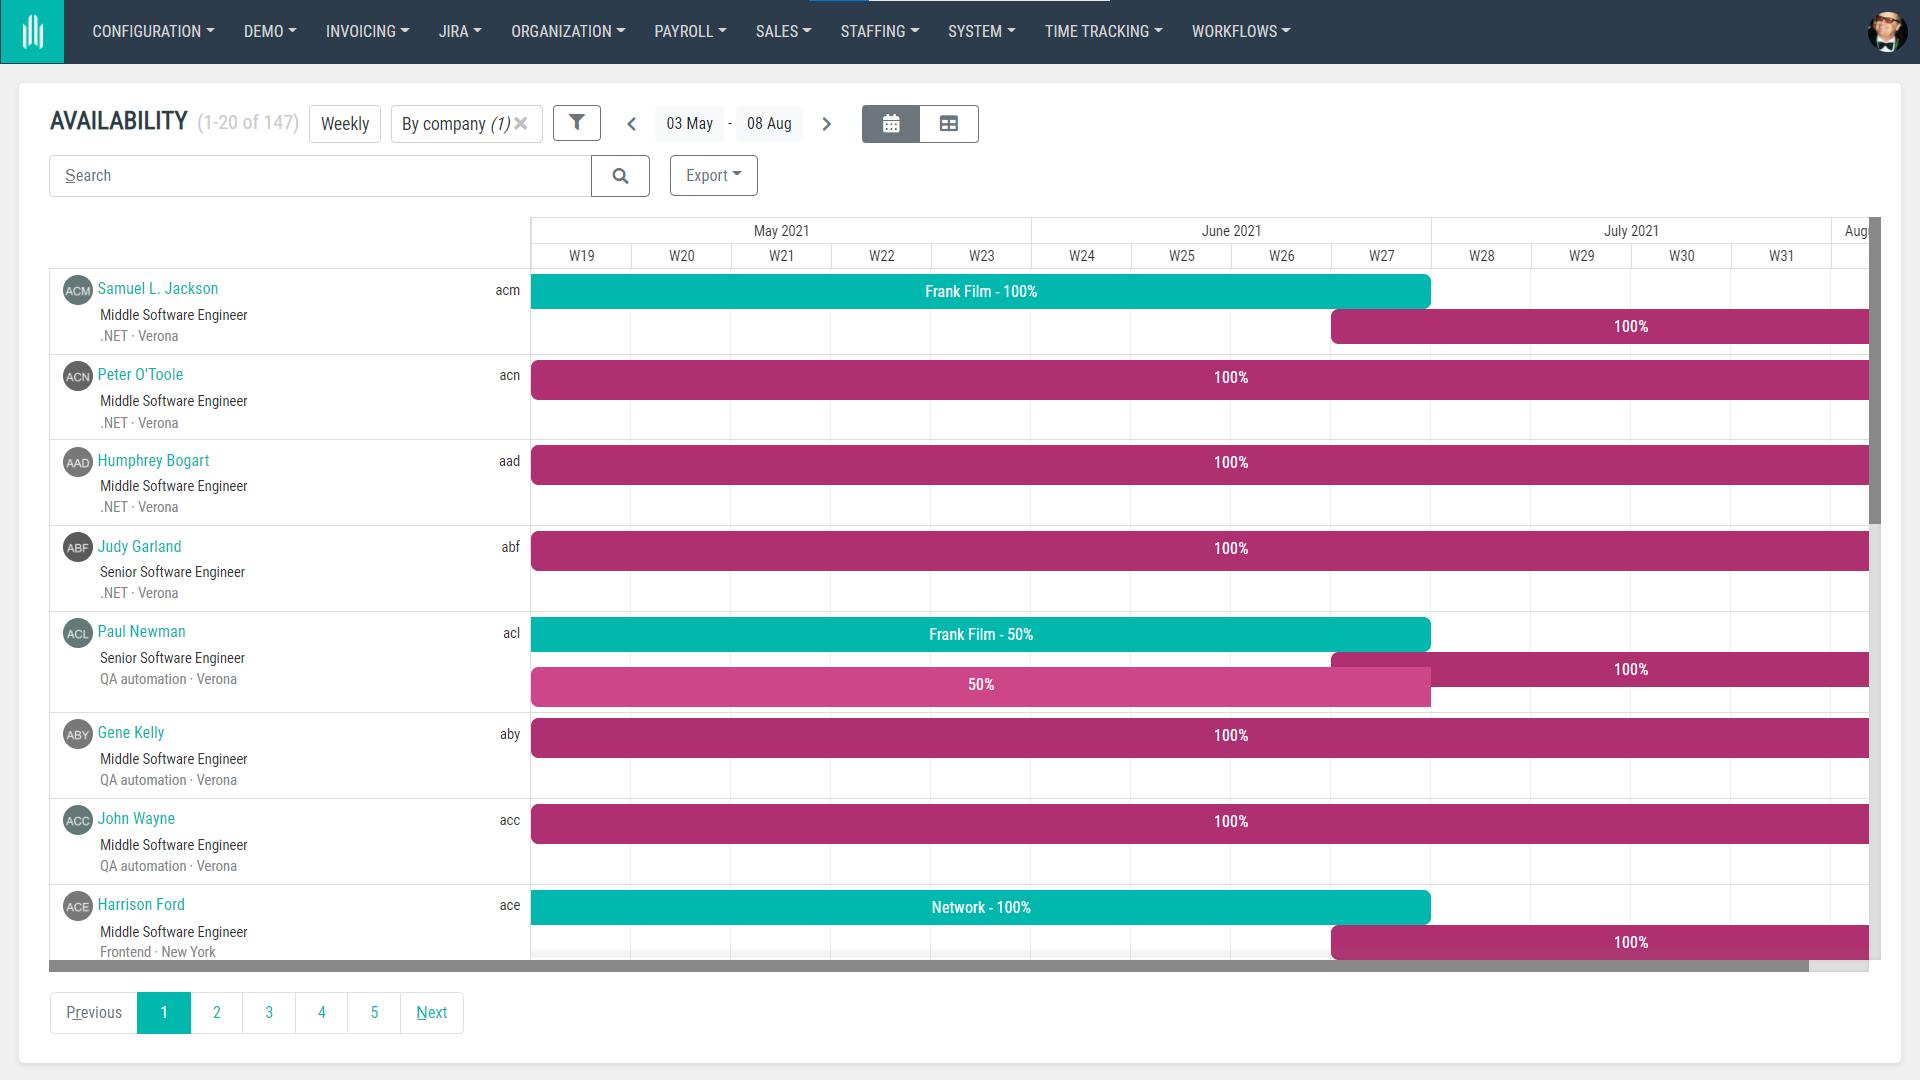 AllPro screenshot availability view